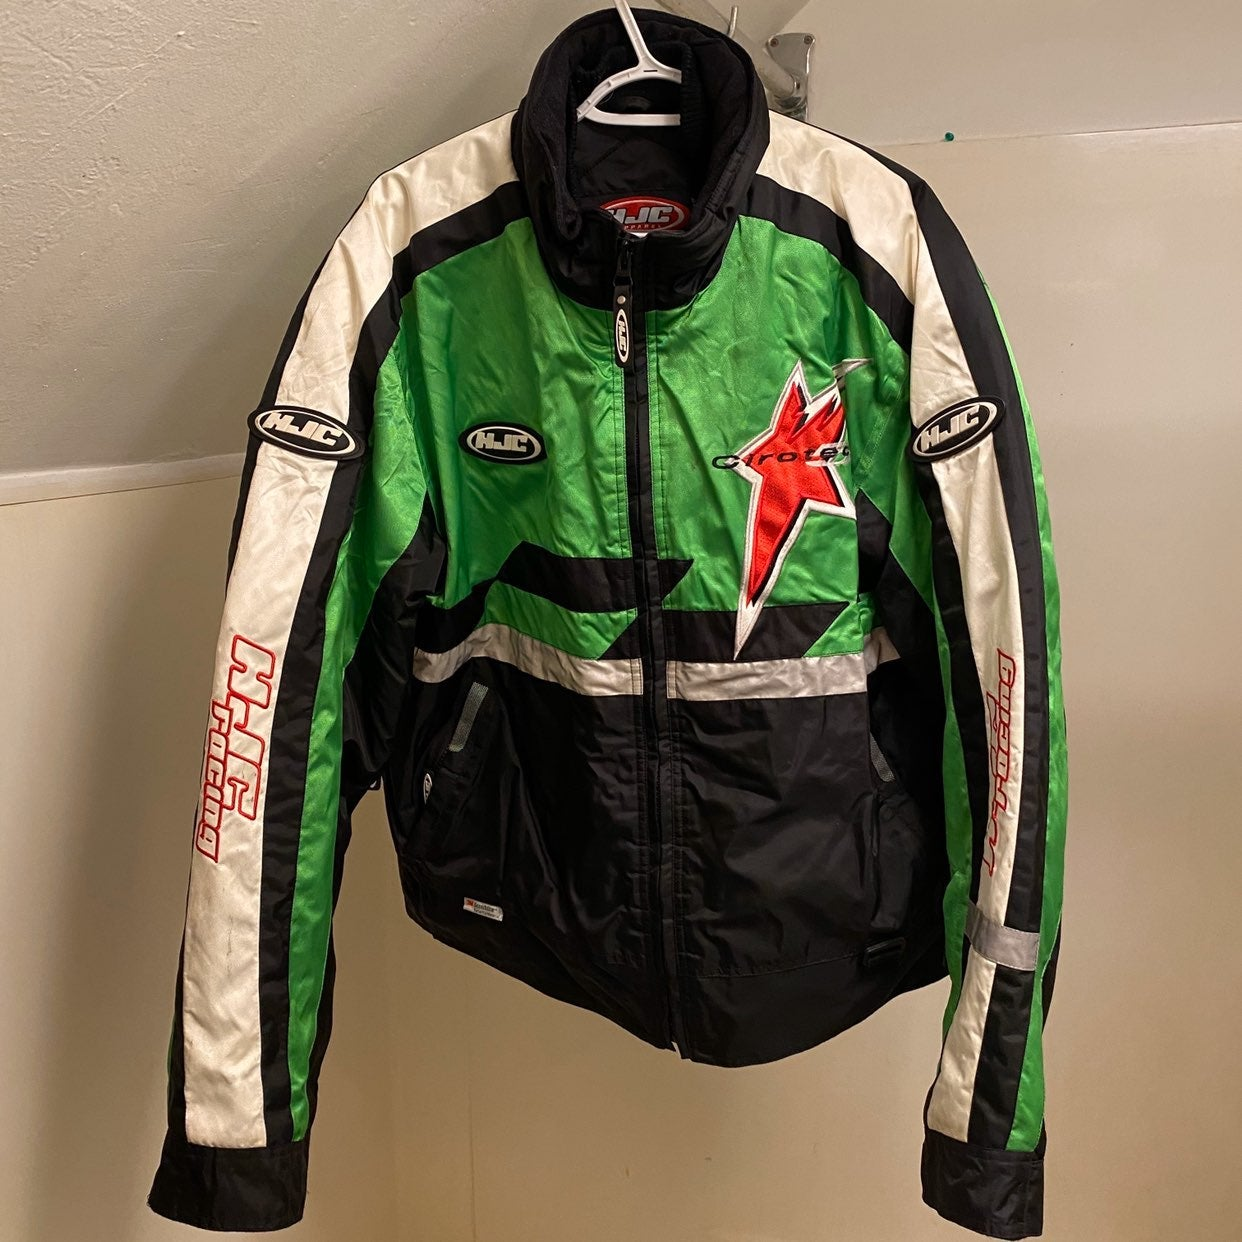 HJC Racing 3M Riding Jacket